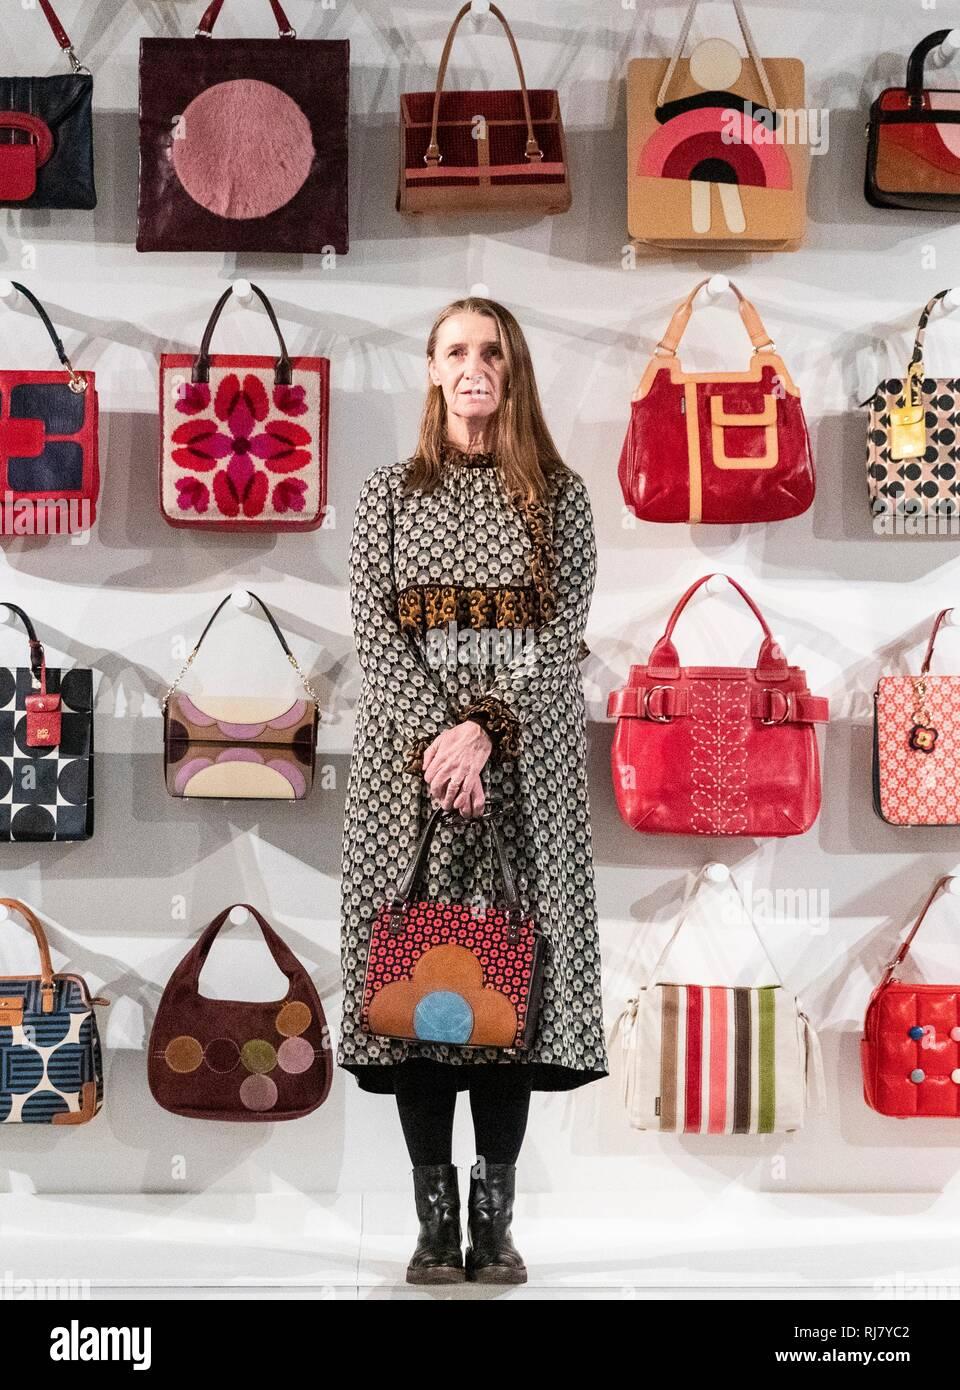 Edinburgh, UK. 05th Feb, 2019. Fashion designer, Orla Kiely